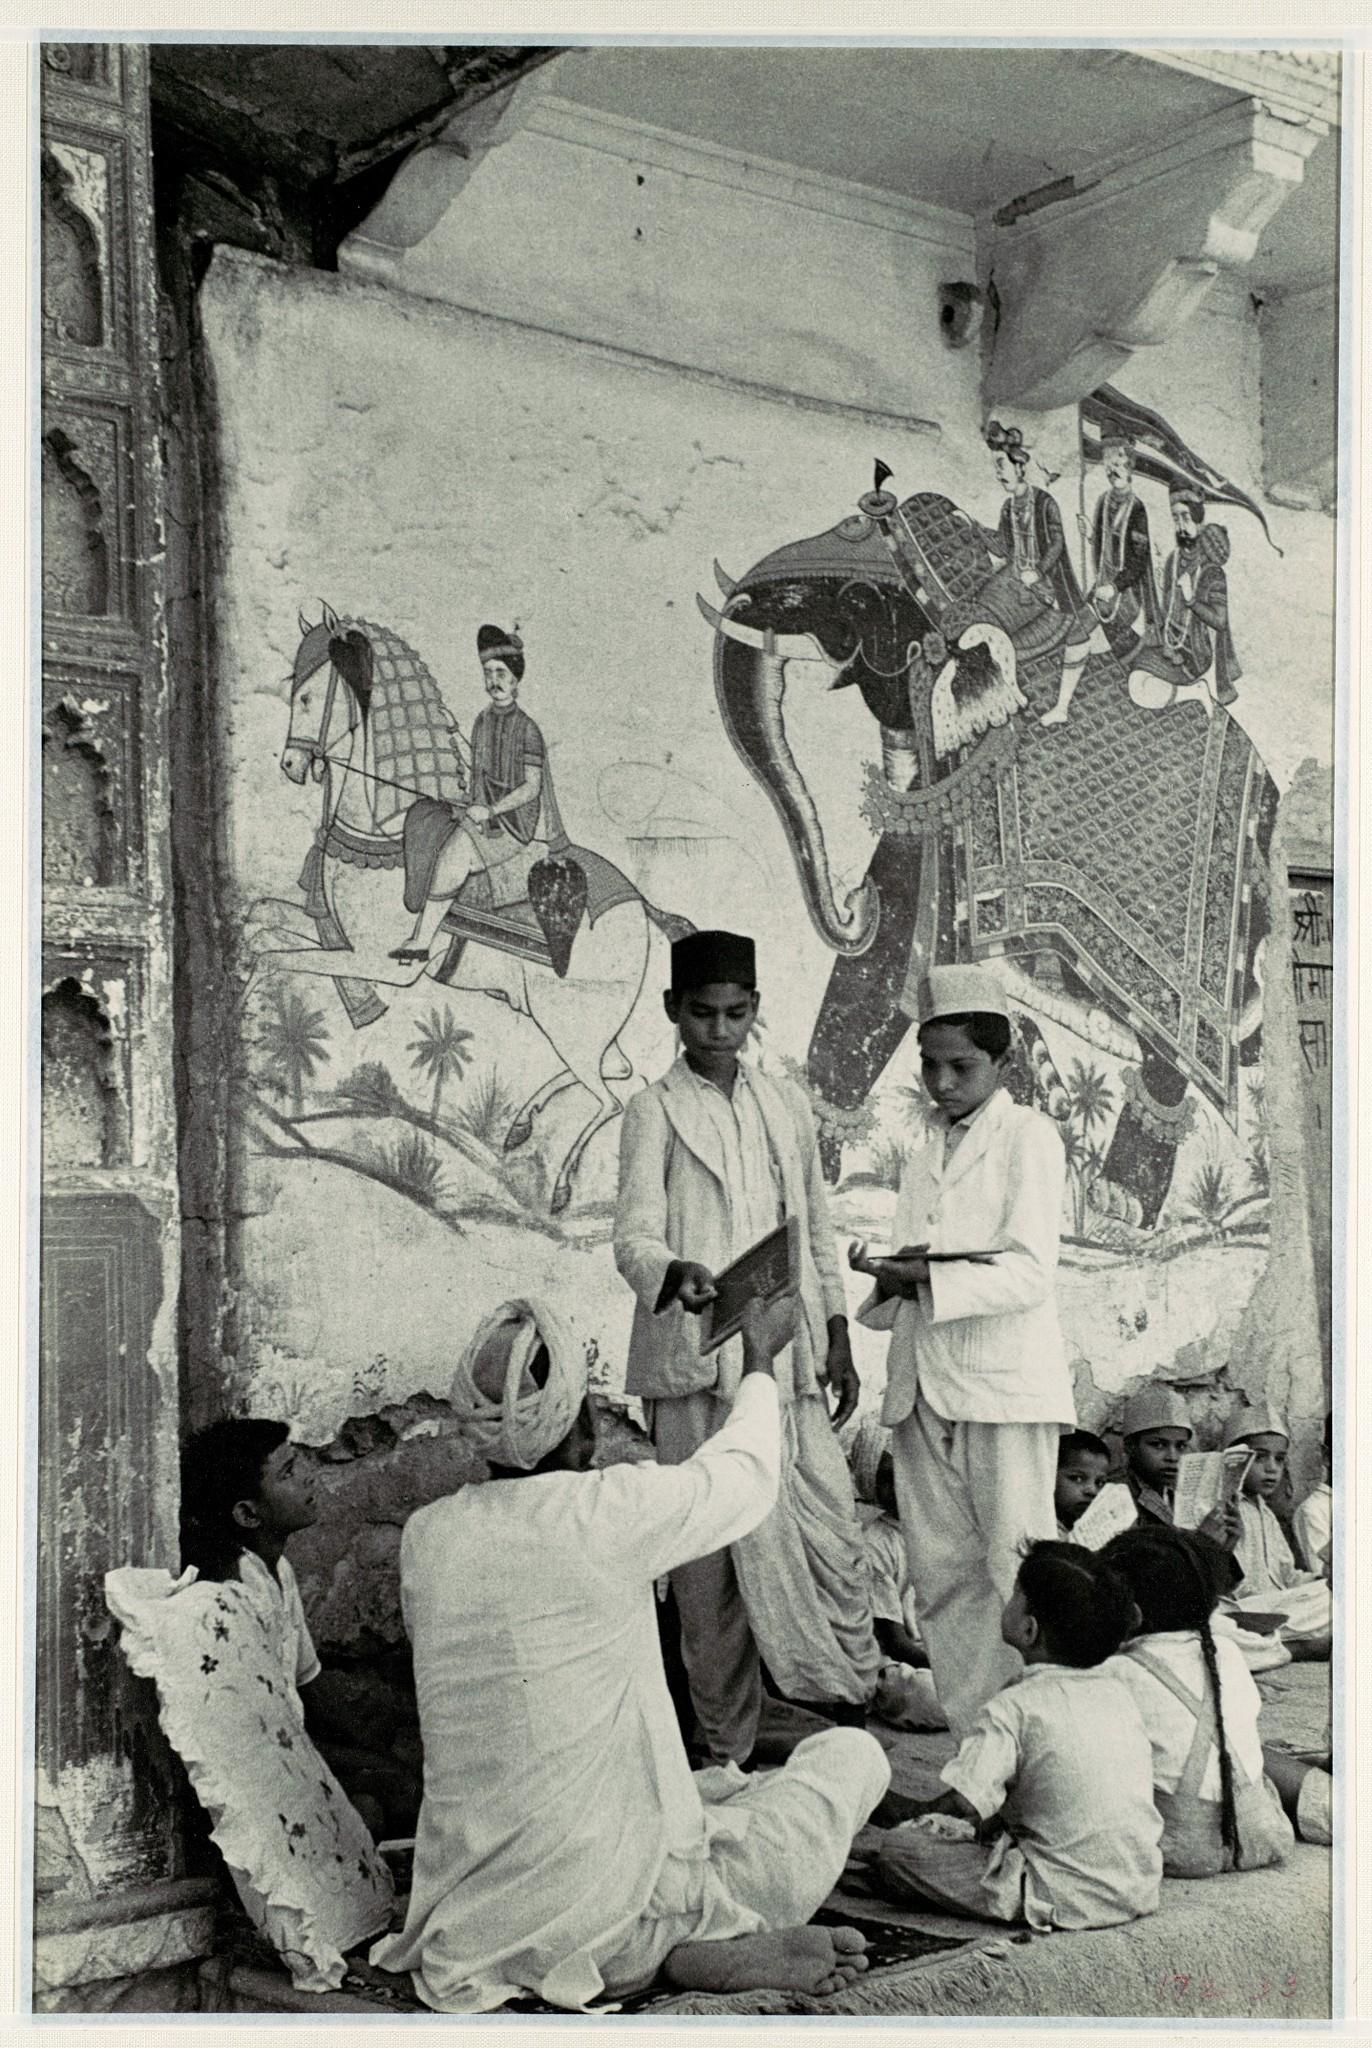 Pavement School, Gelatin Silver Print - Jaipur, c1948